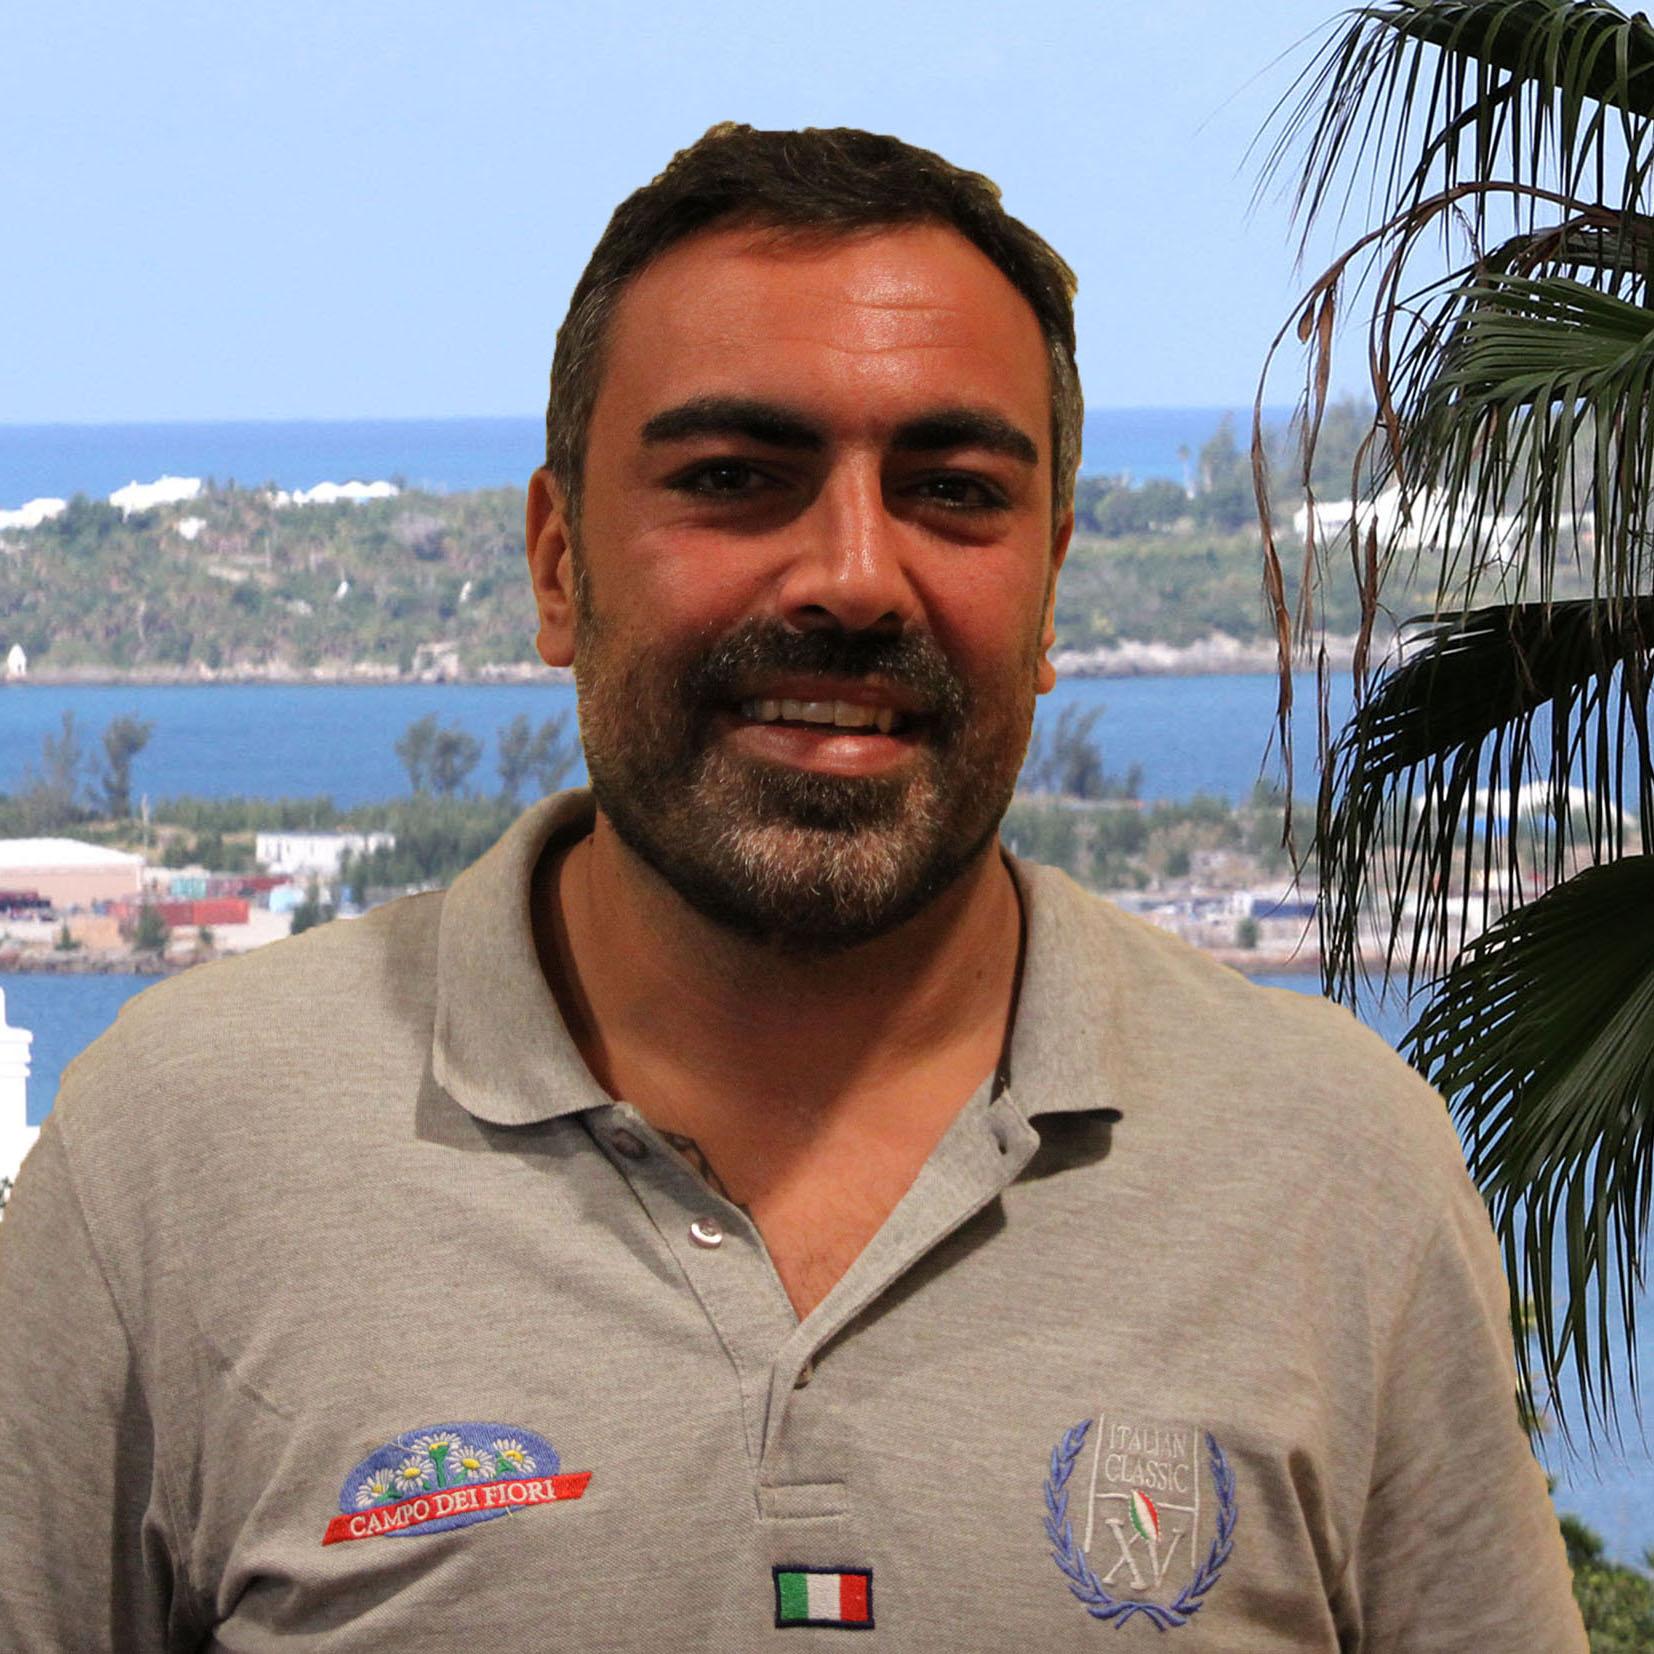 https://www.rugbyitalianclassicxv.com/wp-content/uploads/2019/04/WorldClassic2018_Bermuda_20181104_00_Cipolla_ph_Turchetto.jpg